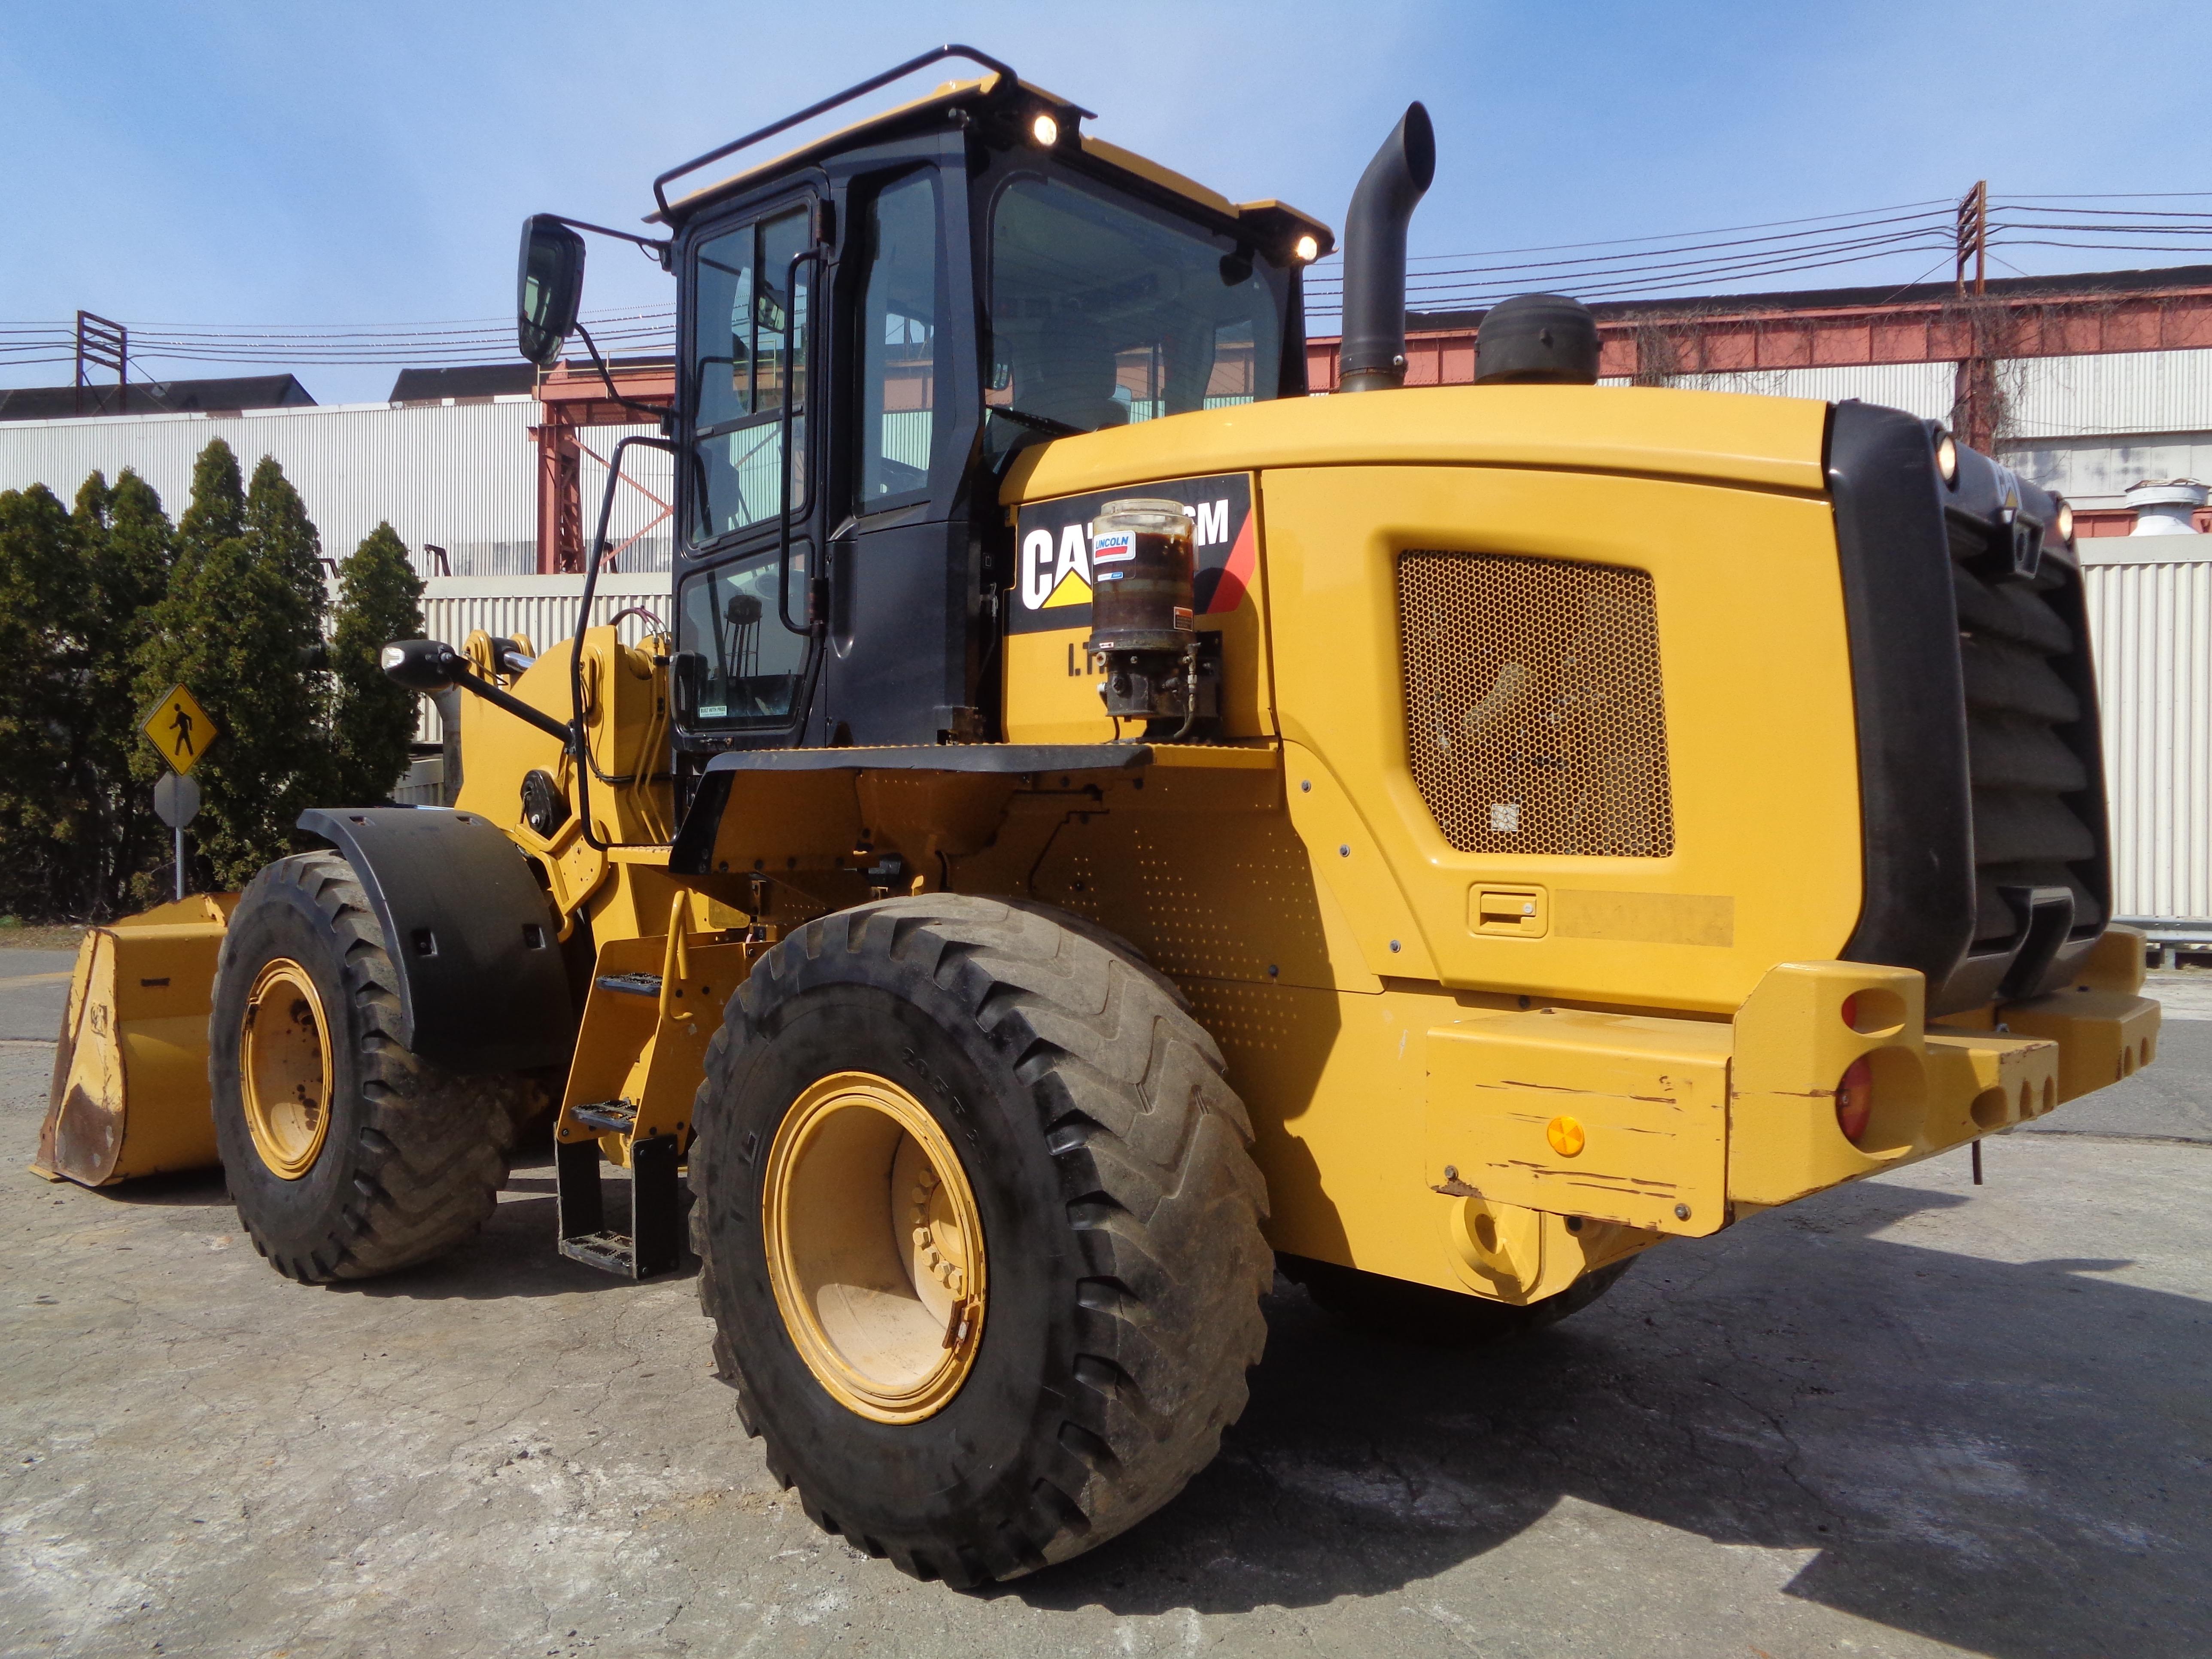 Lot 49 - 2017 Caterpillar 926M Wheel Loader